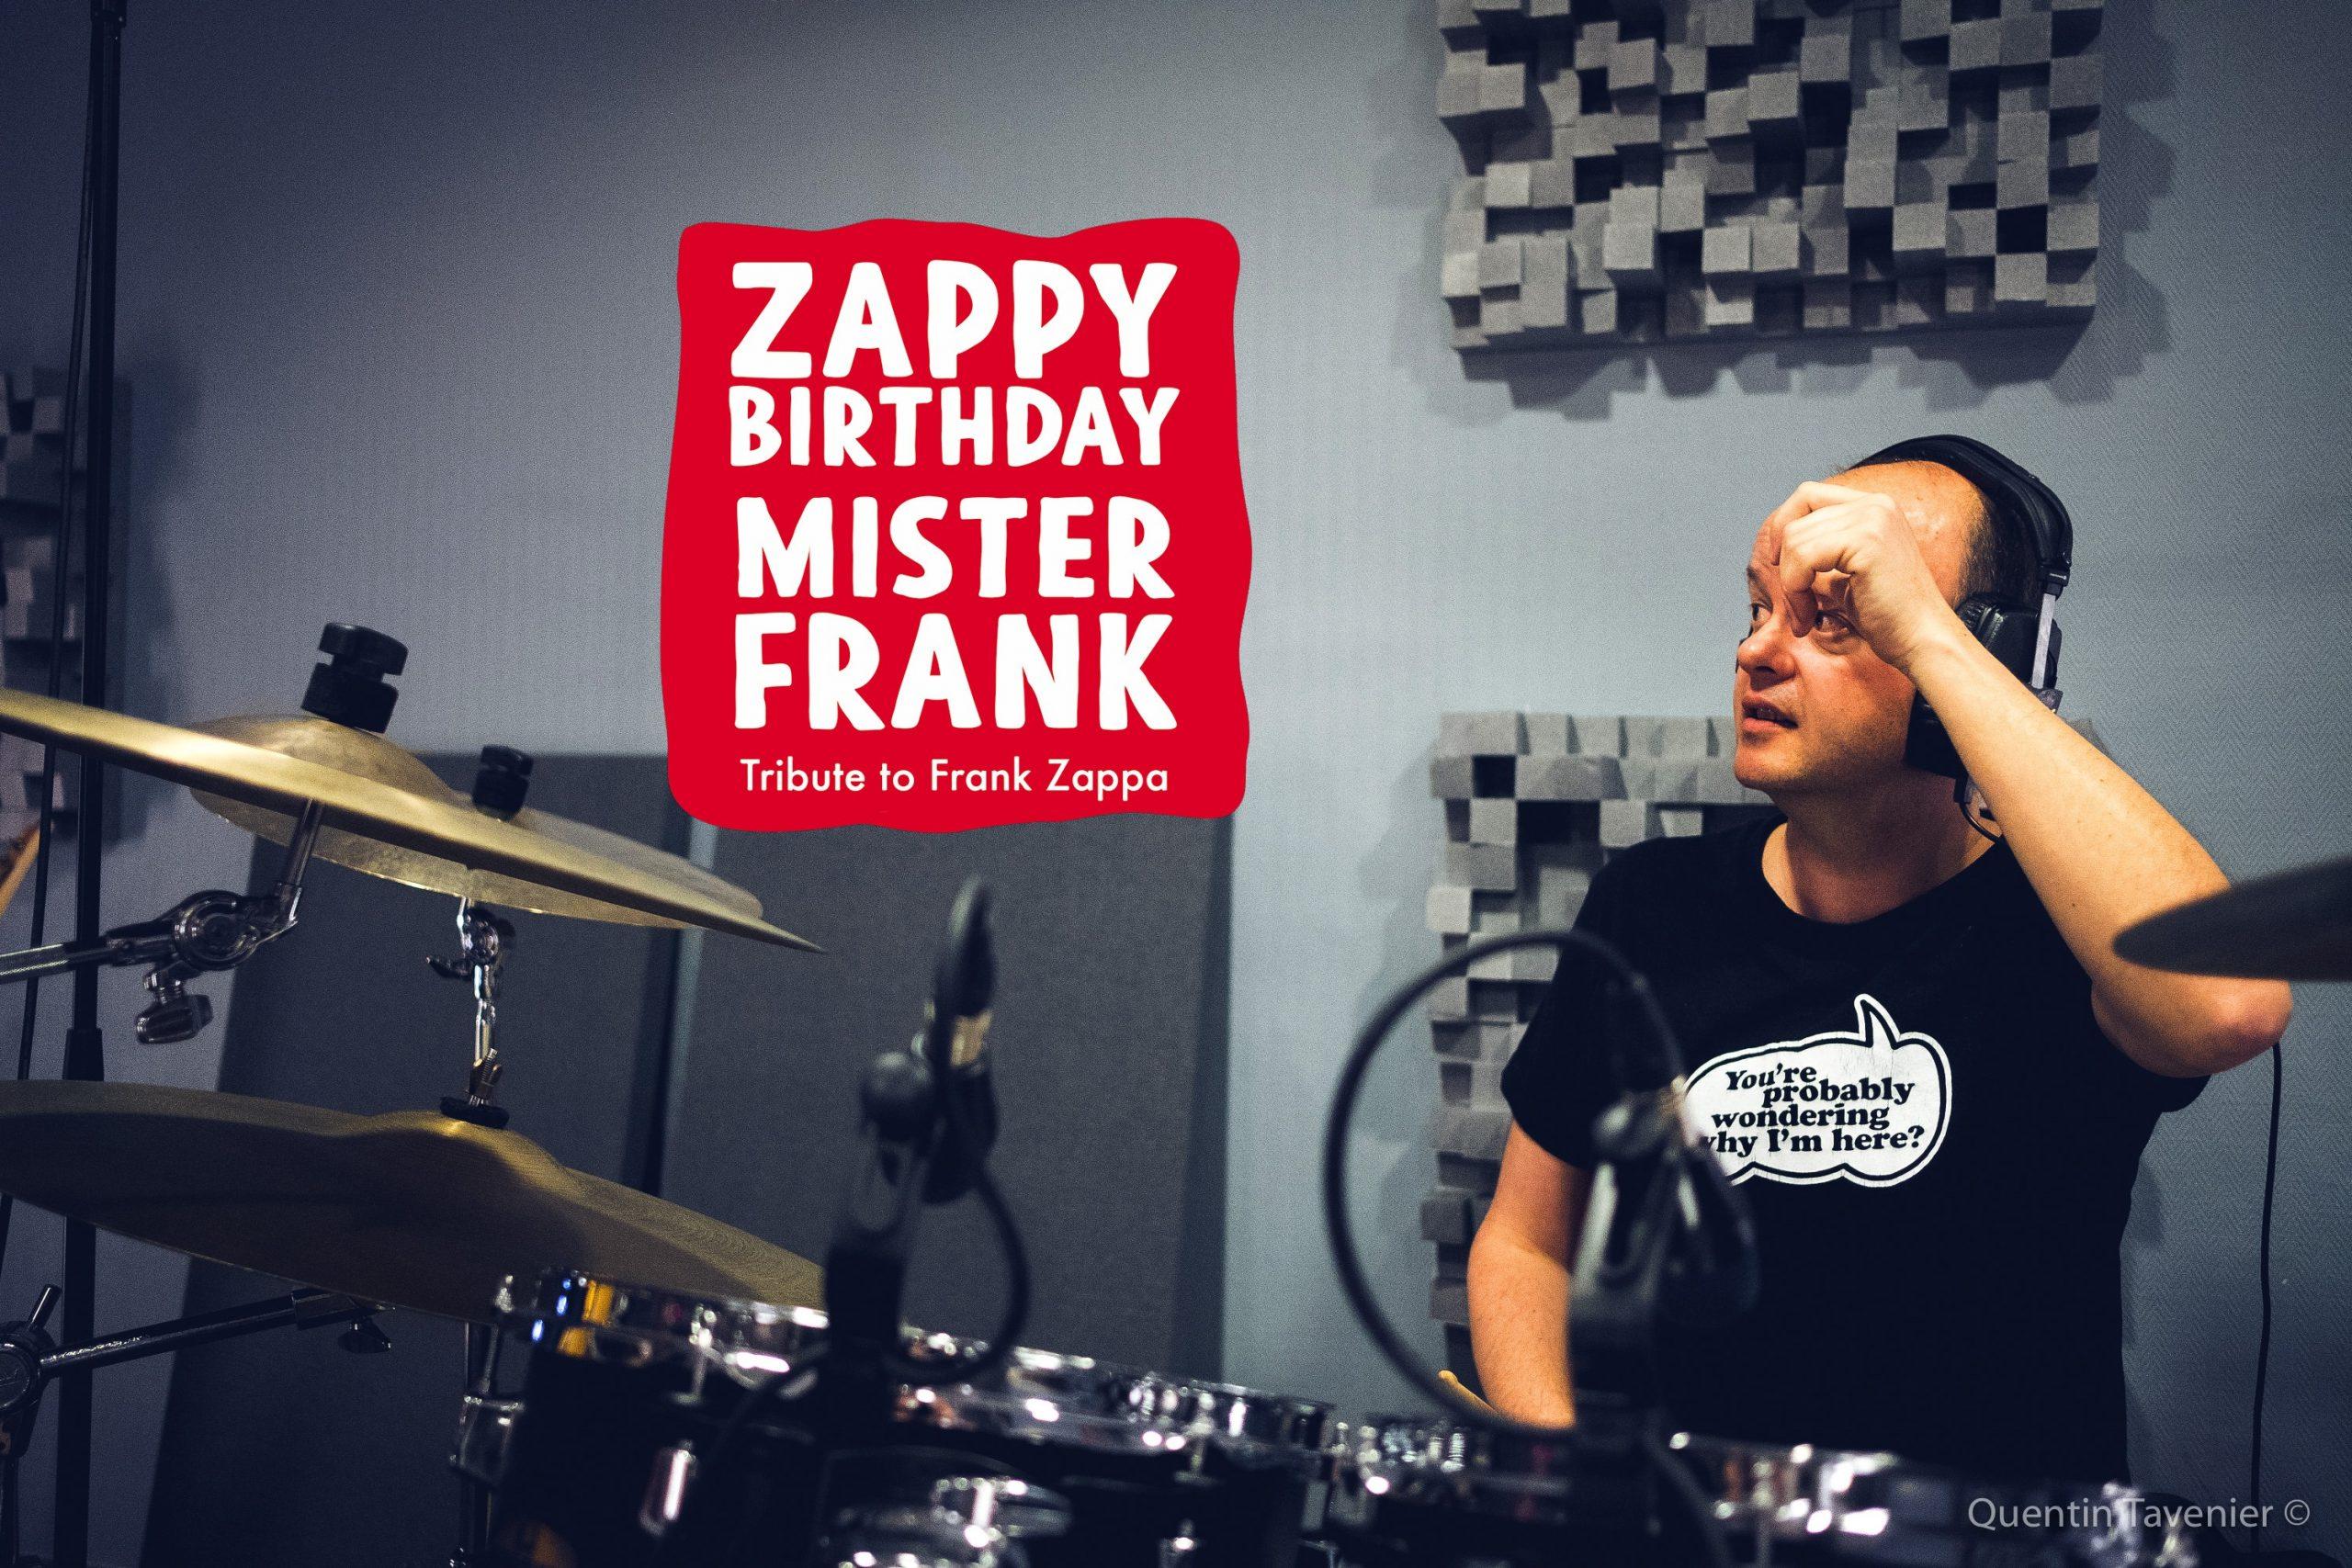 ZBMF a.k.a Zappy Birthday Mister Frank «Pick me I'm clean» Studio Live !